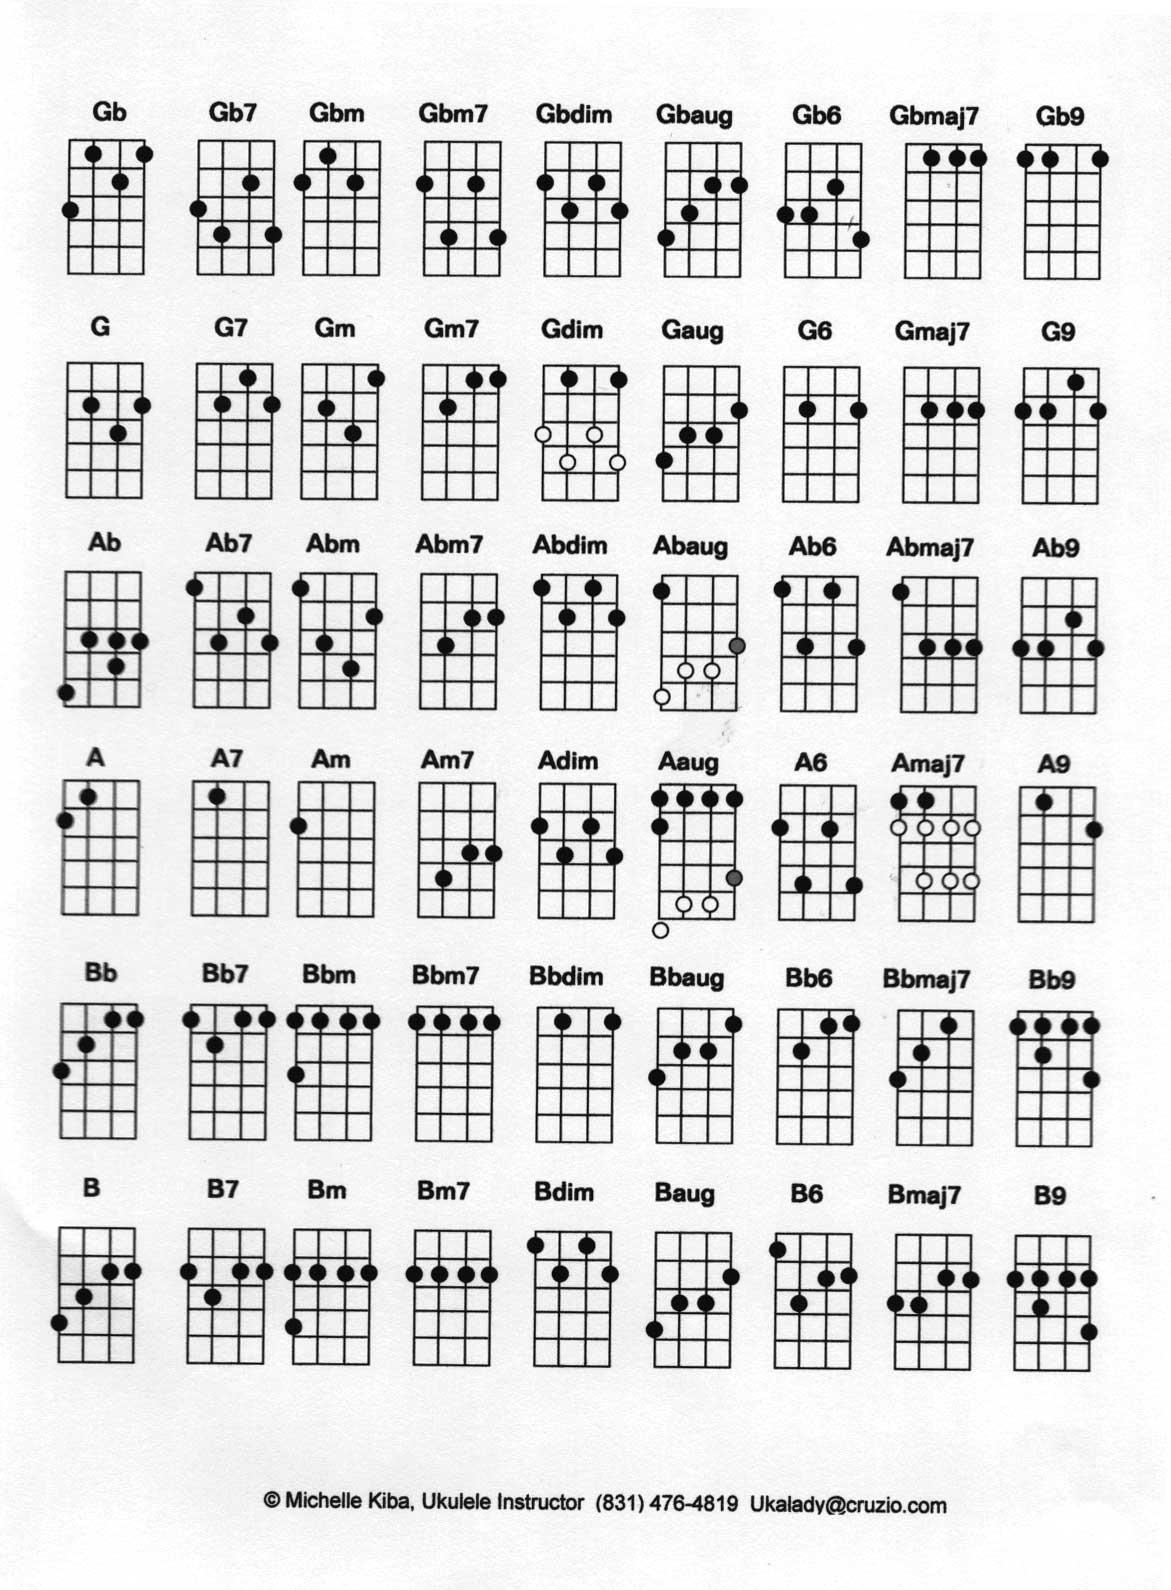 Index Of Musicfilesukulele